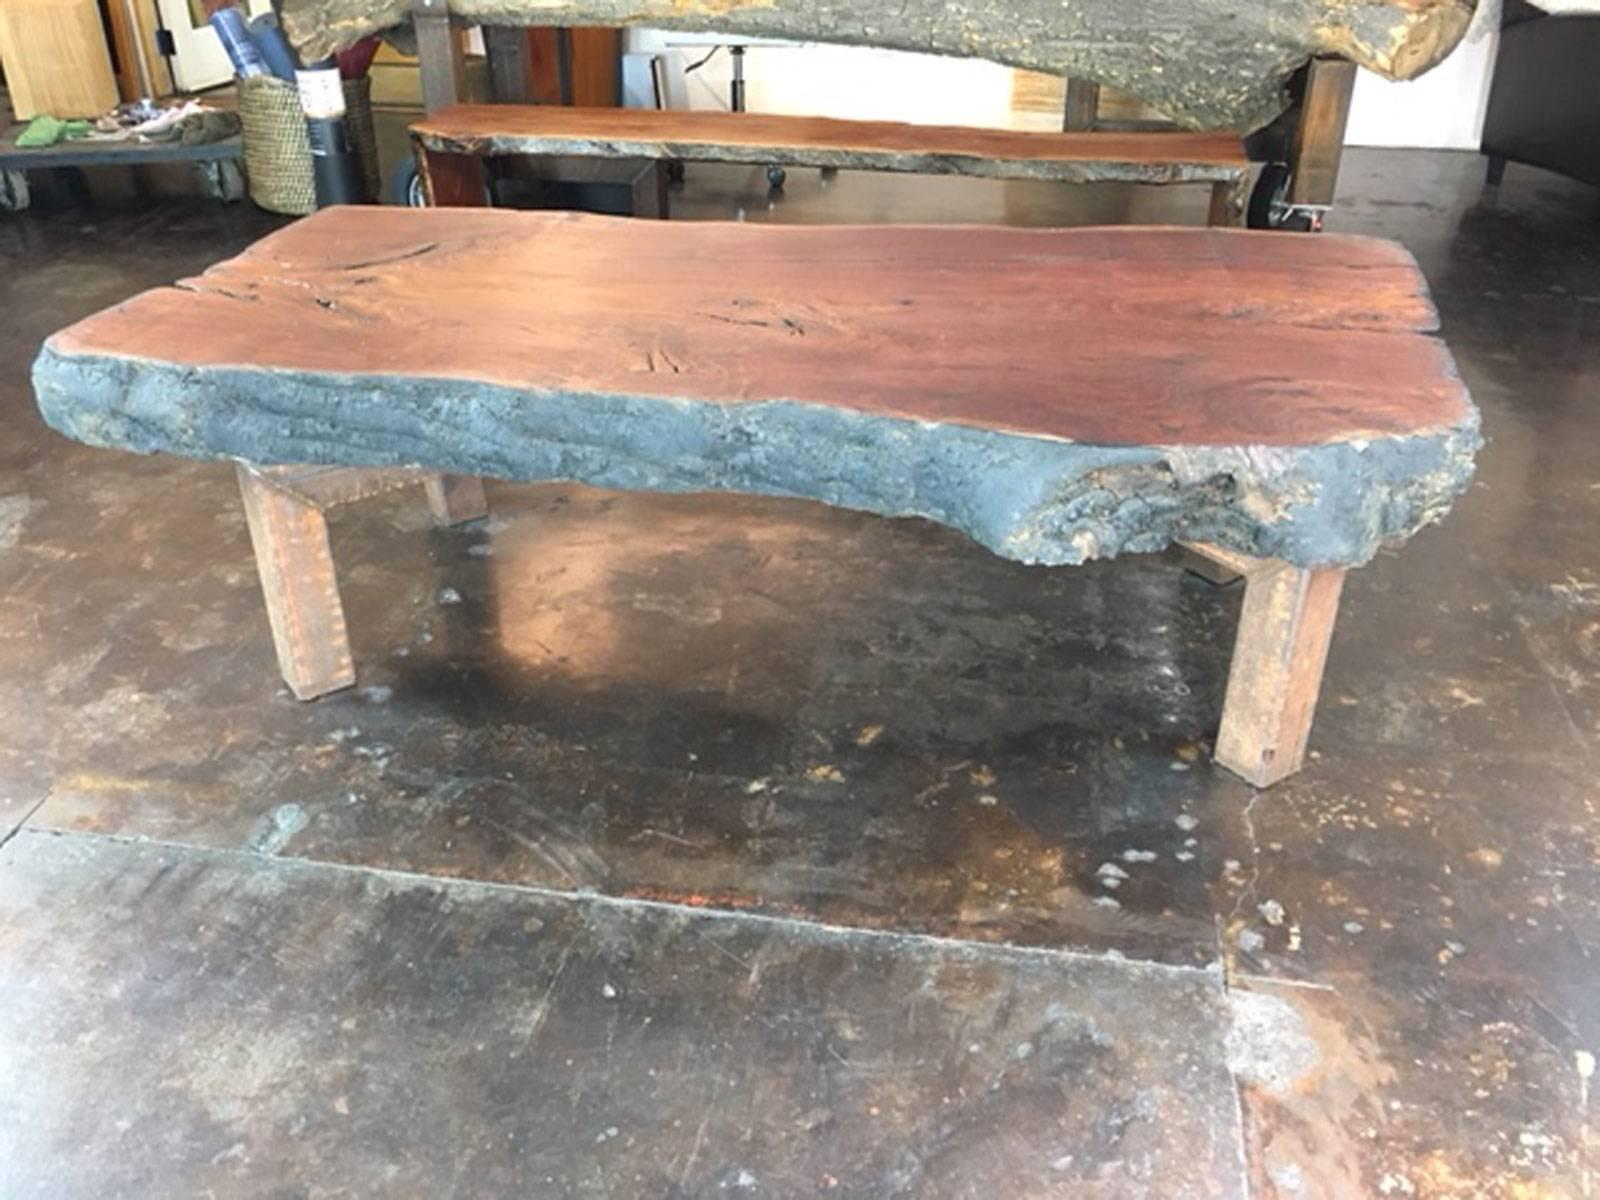 Huge Coffee Table Or Display Table In Eucalyptus Wood For Sale 2